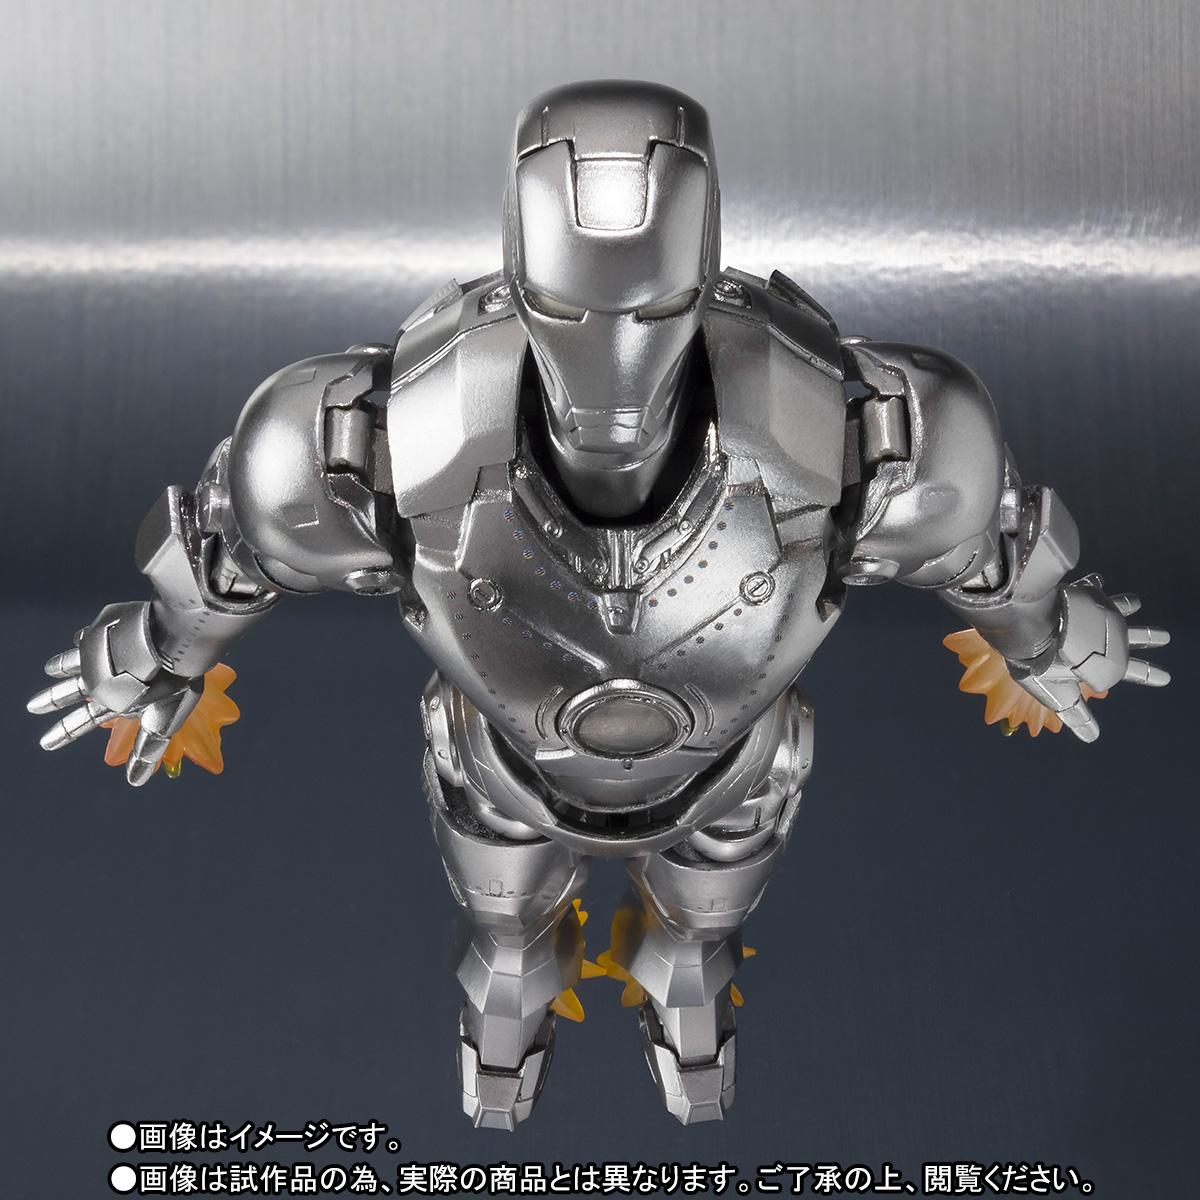 [Comentários] Marvel S.H.Figuarts - Página 2 WvmiJHCB